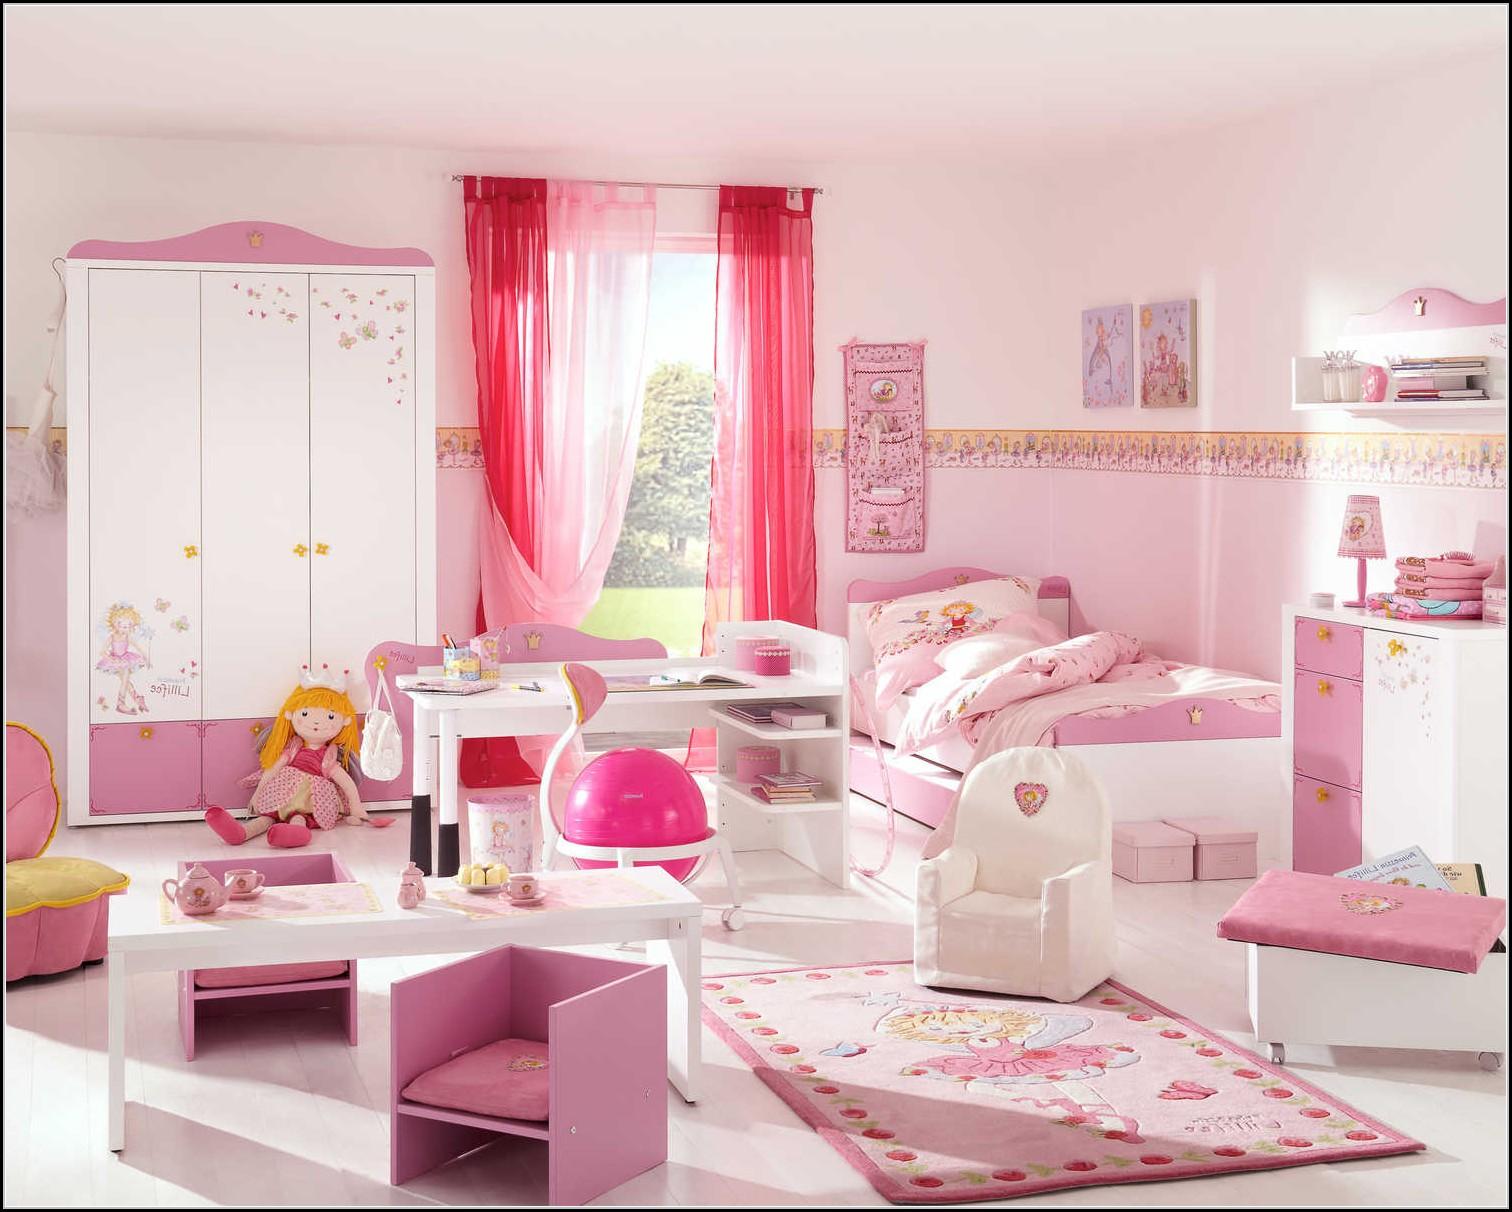 Prinzessin Lillifee Kinderzimmer